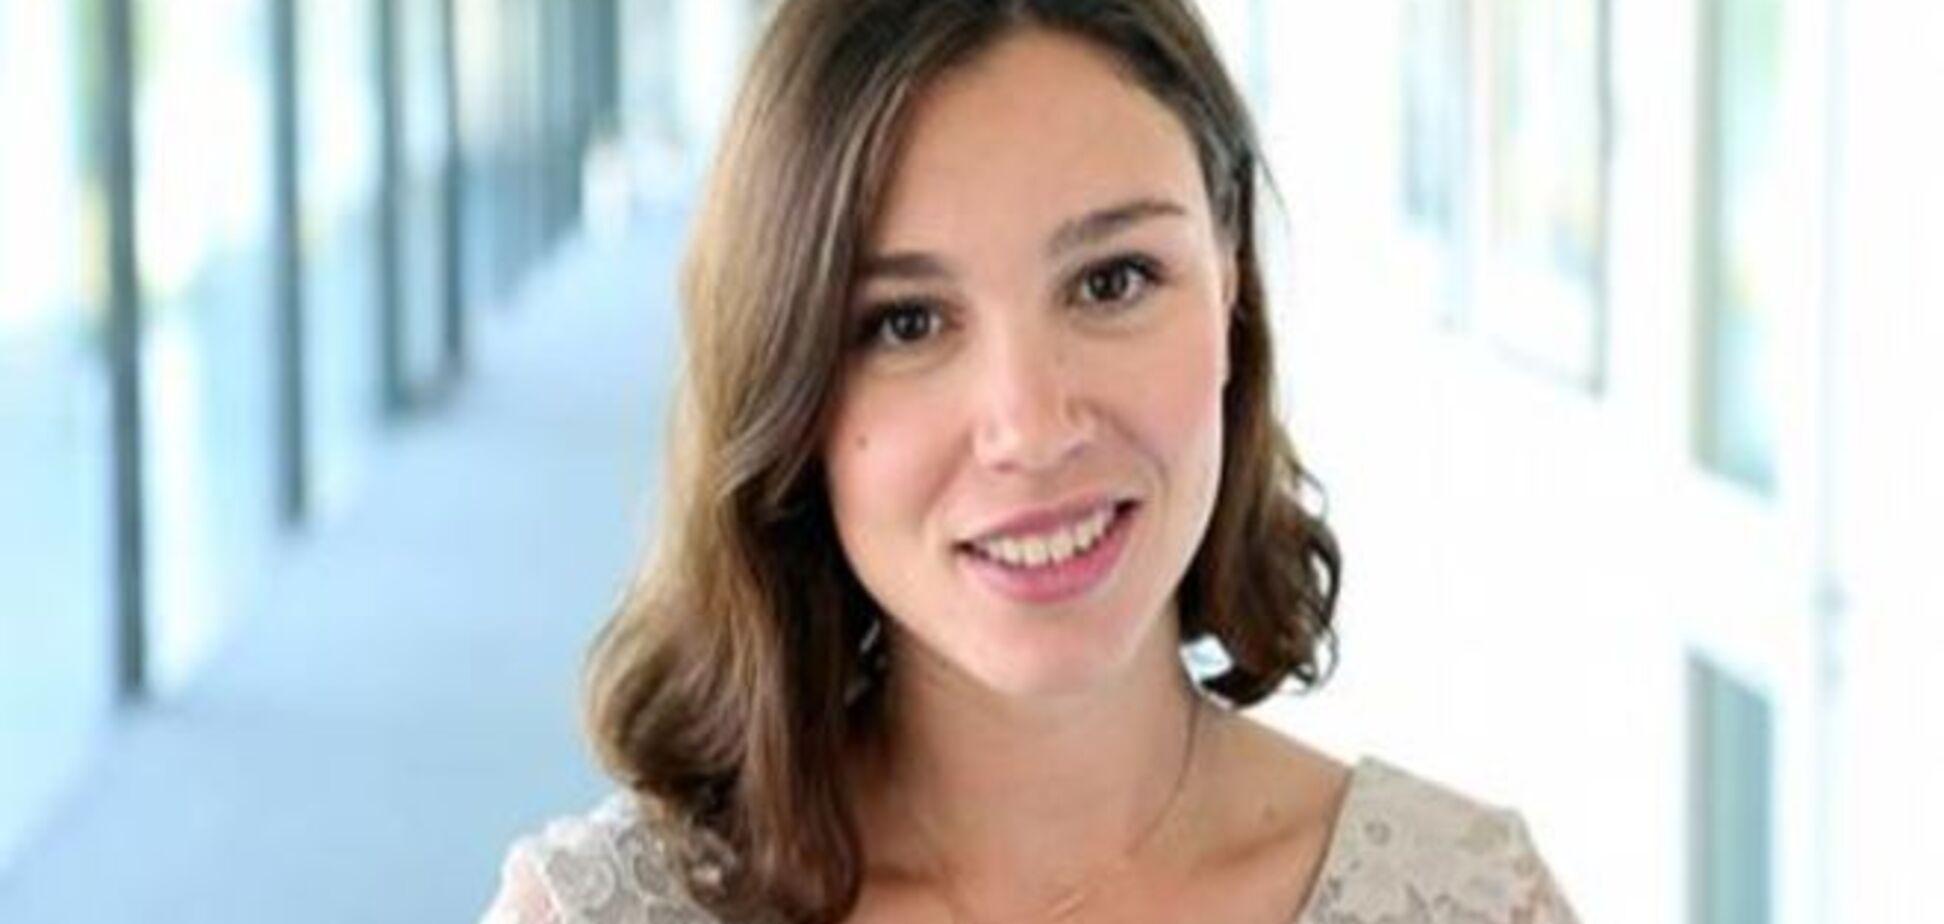 Жанна Нємцова стане репортеркою Deutsche Welle